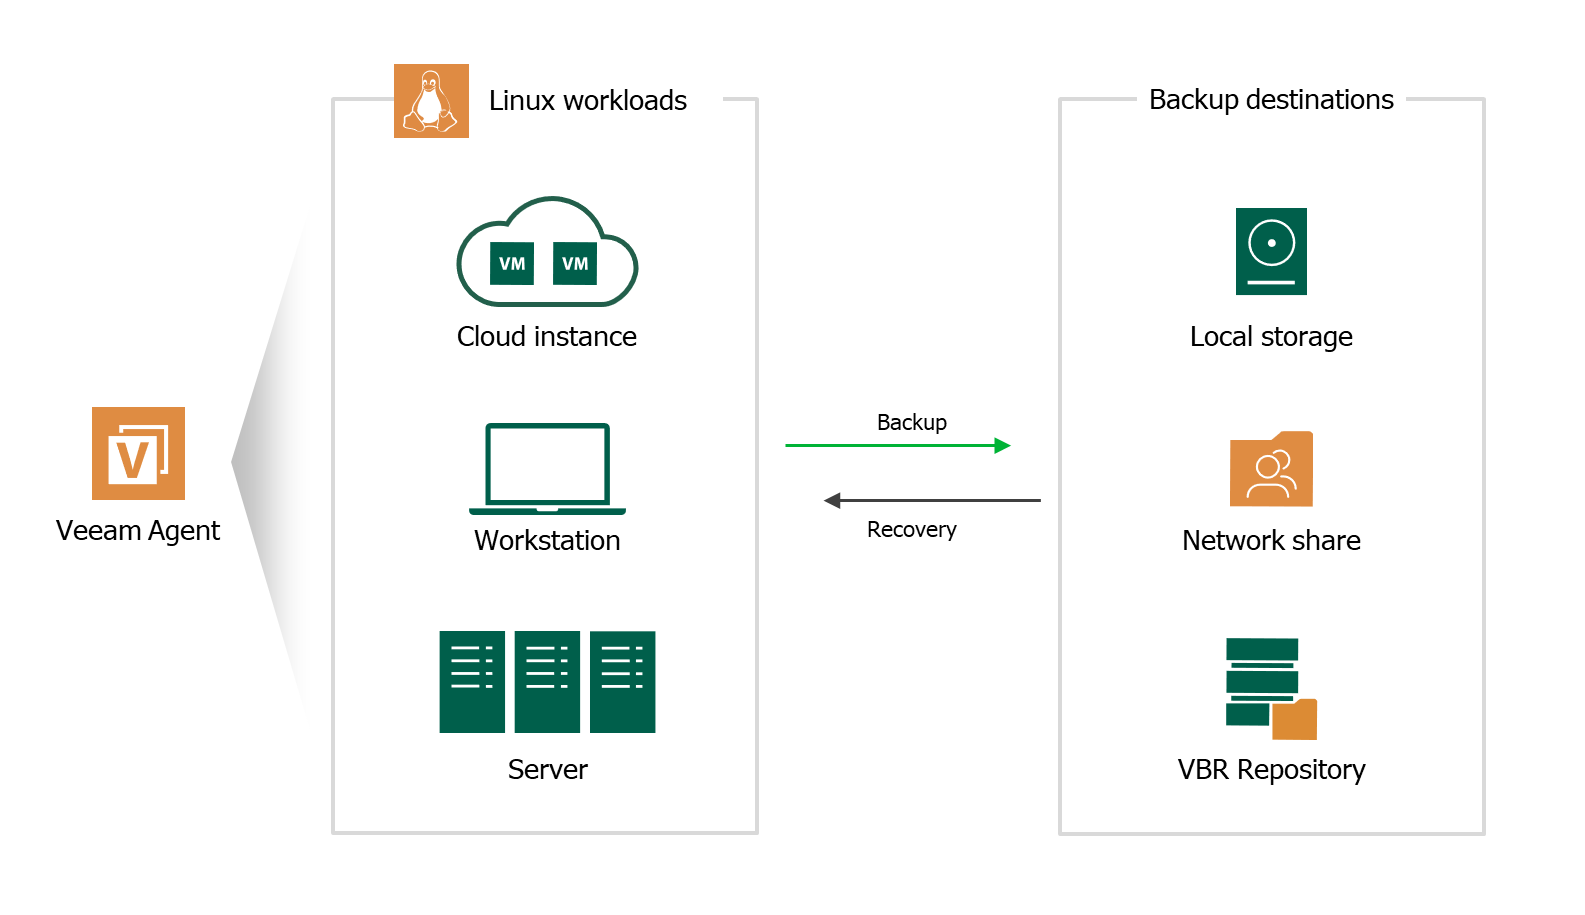 Solución de backup para servidor Linux - Veeam Agent for Linux